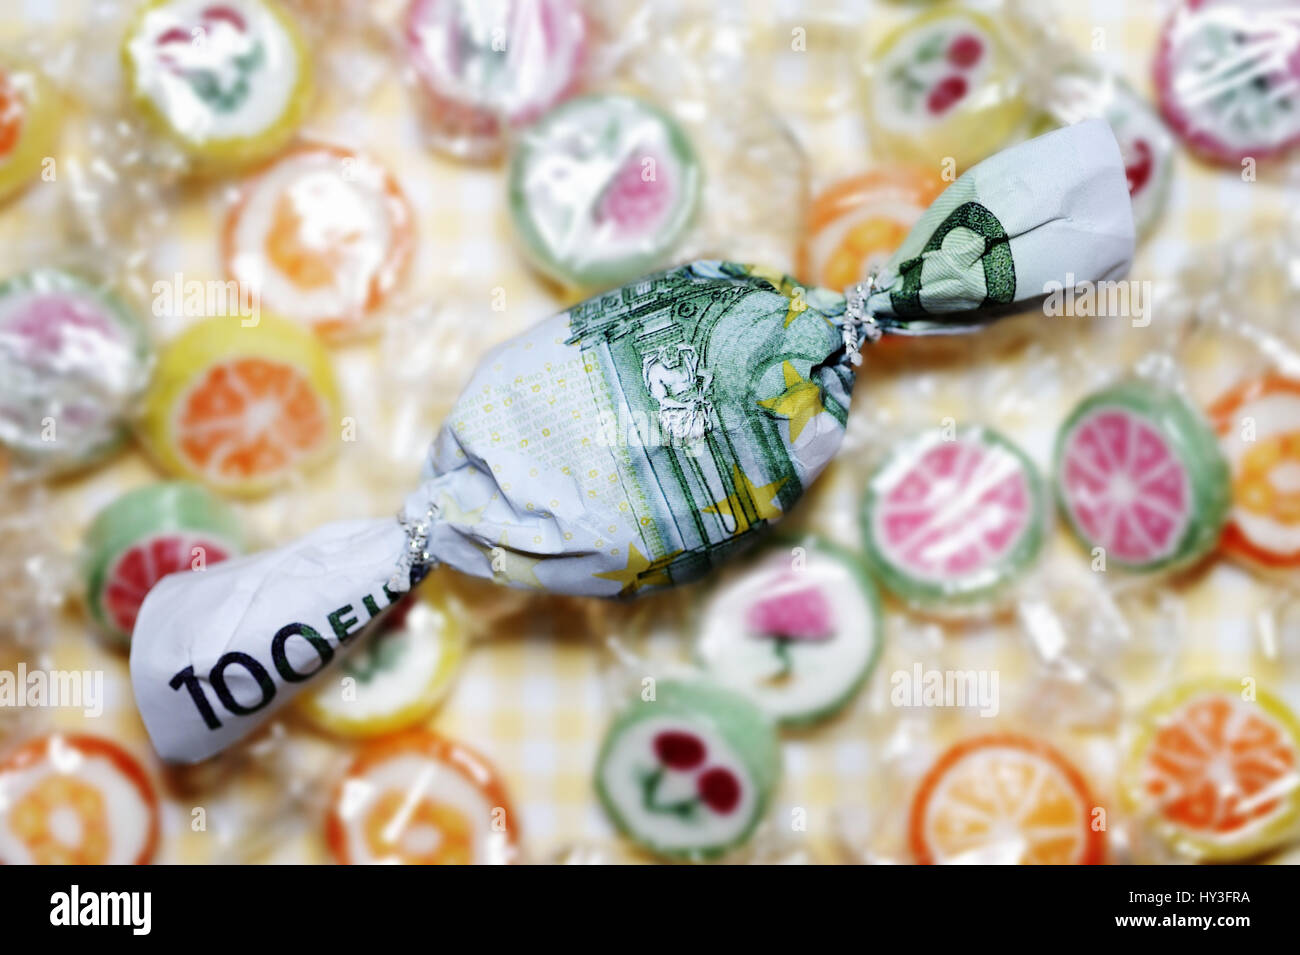 Sweet in euro-light hundred muffled, bonus payments, Bonbon in Hundert-Euro-Schein eingewickelt, Bonuszahlungen Stock Photo